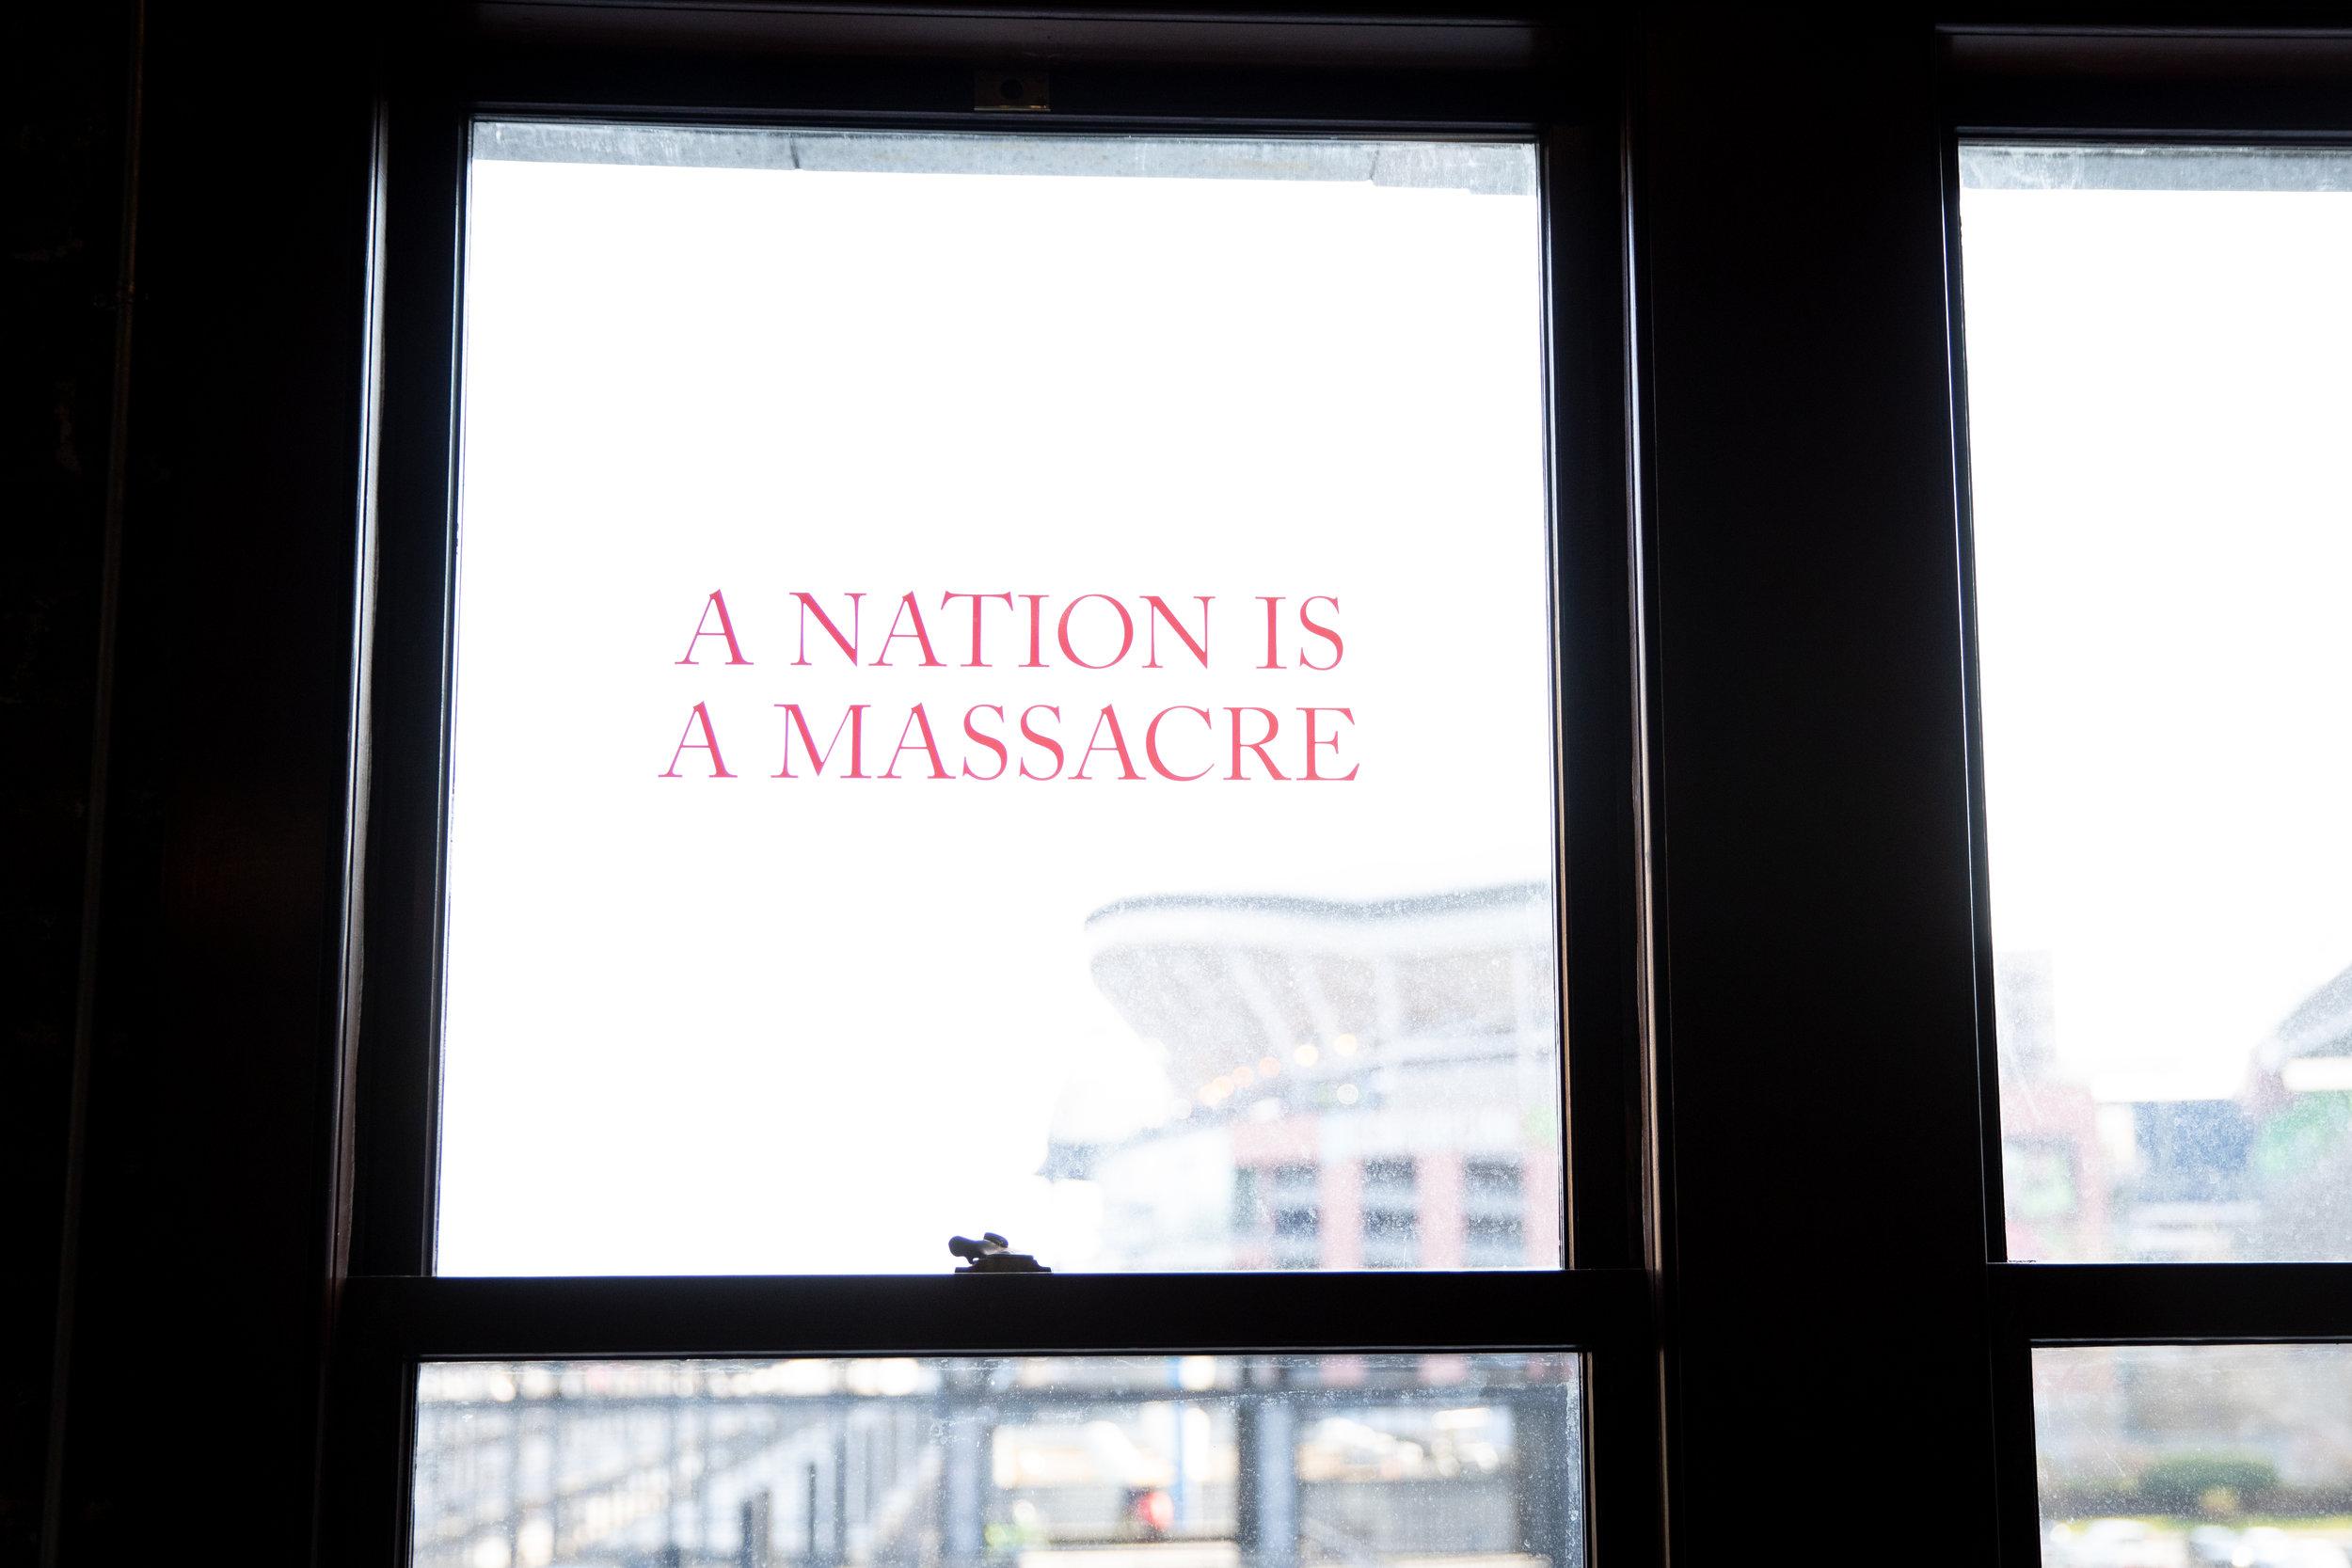 A Nation is a Massacre (alternate view)